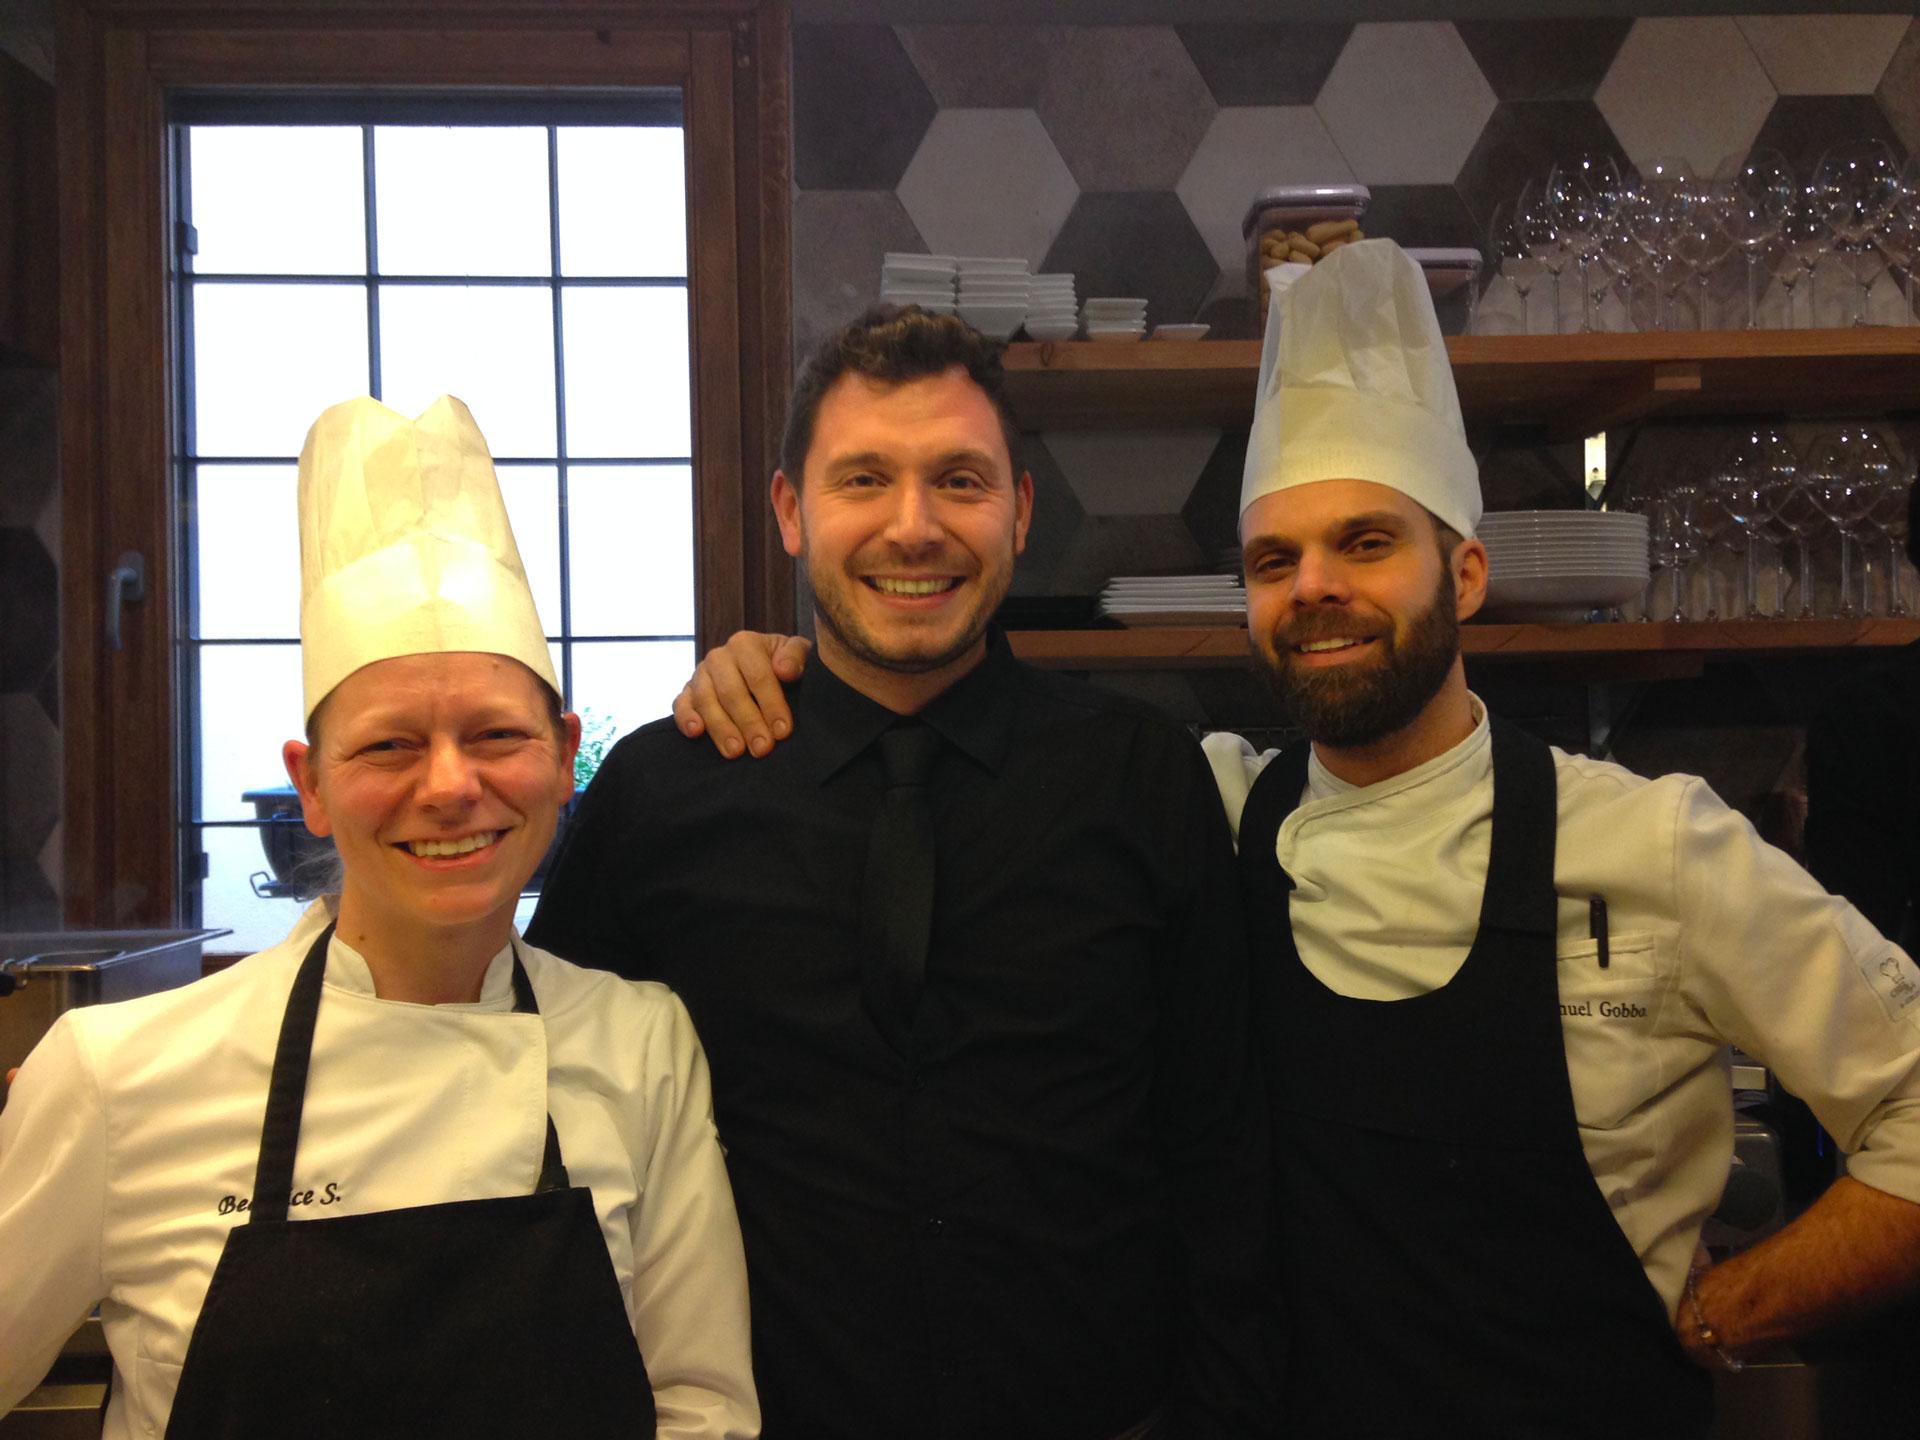 Al Corder: cucina gourmet in centro a Treviso